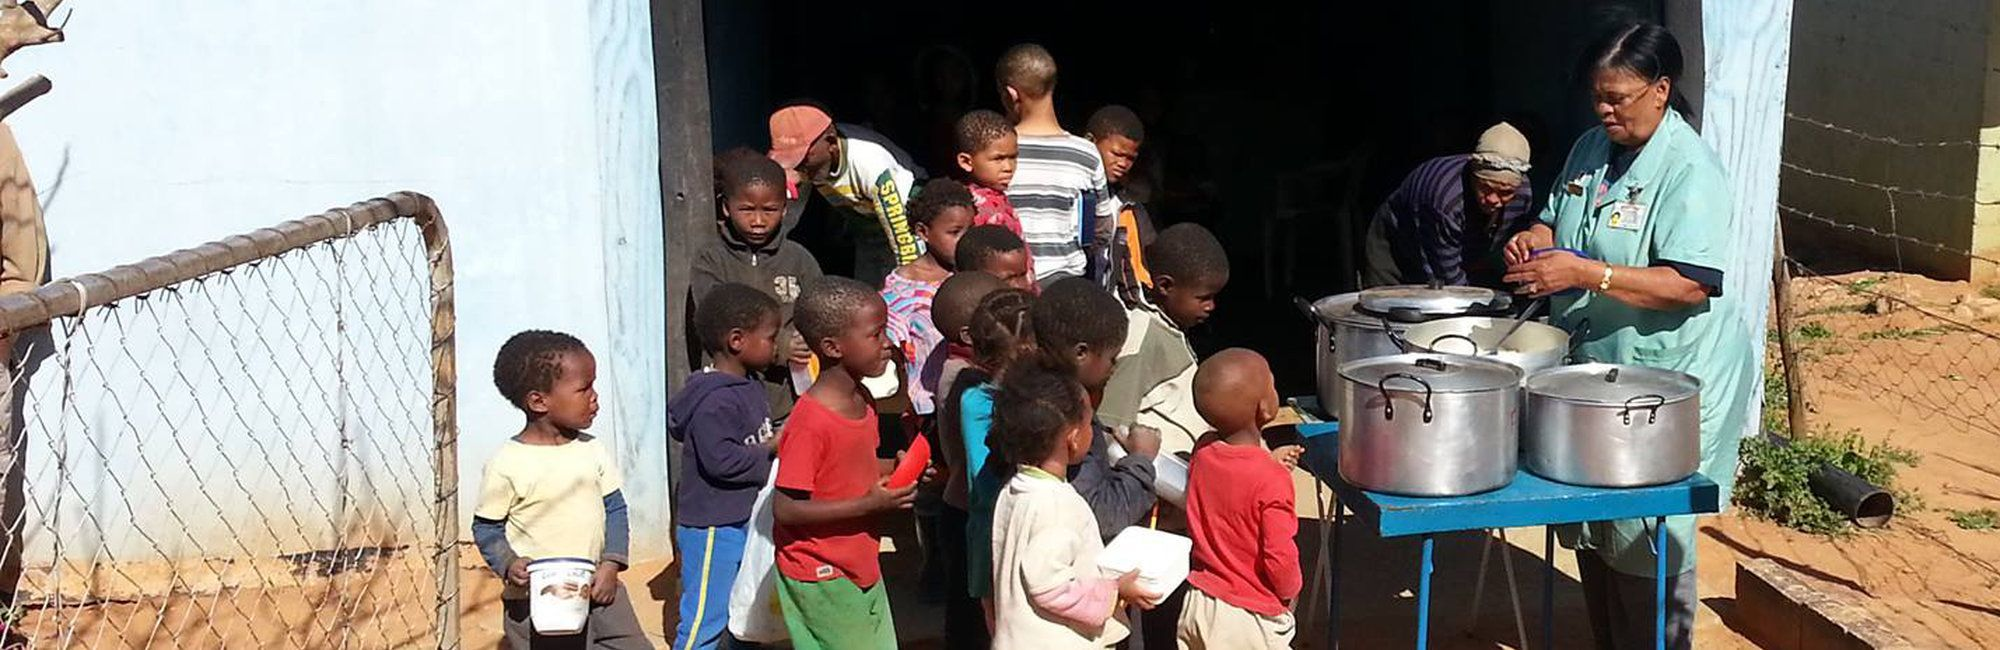 Project Nkosi Foundation